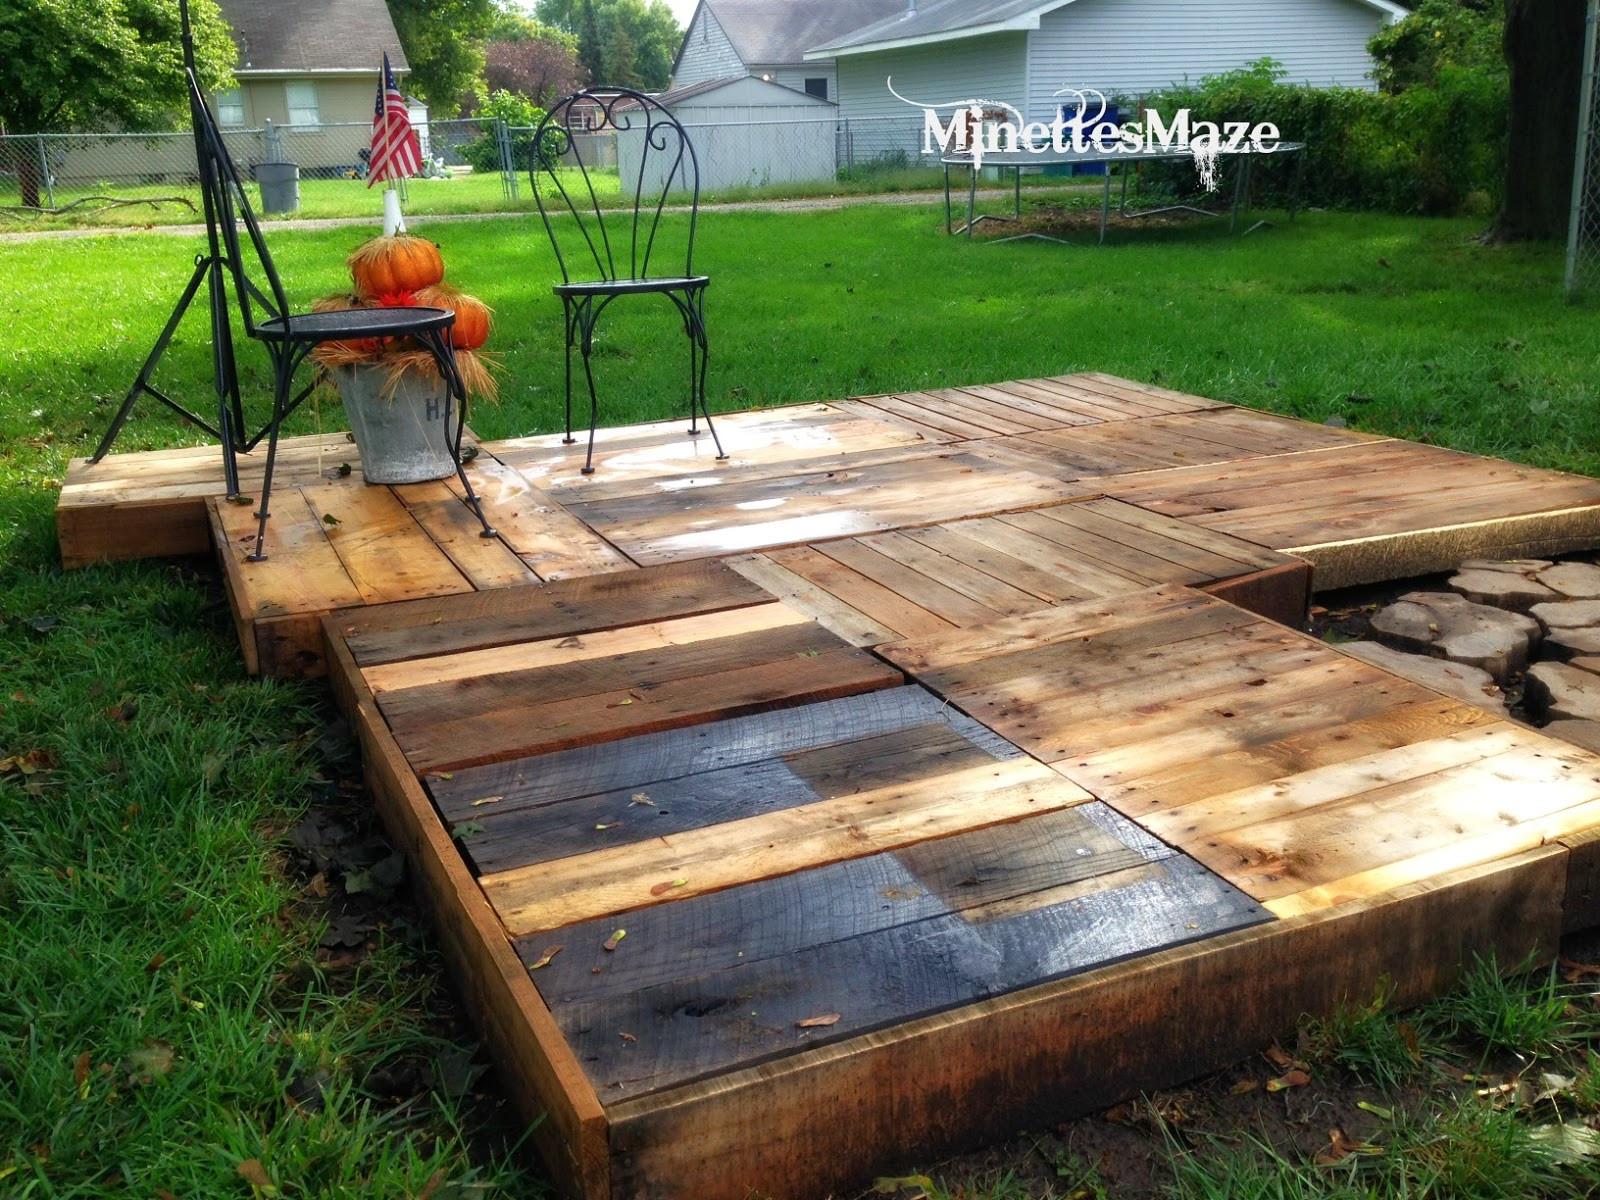 Best ideas about Pallet Decking DIY . Save or Pin MinettesMaze DIY Pallet Deck Now.